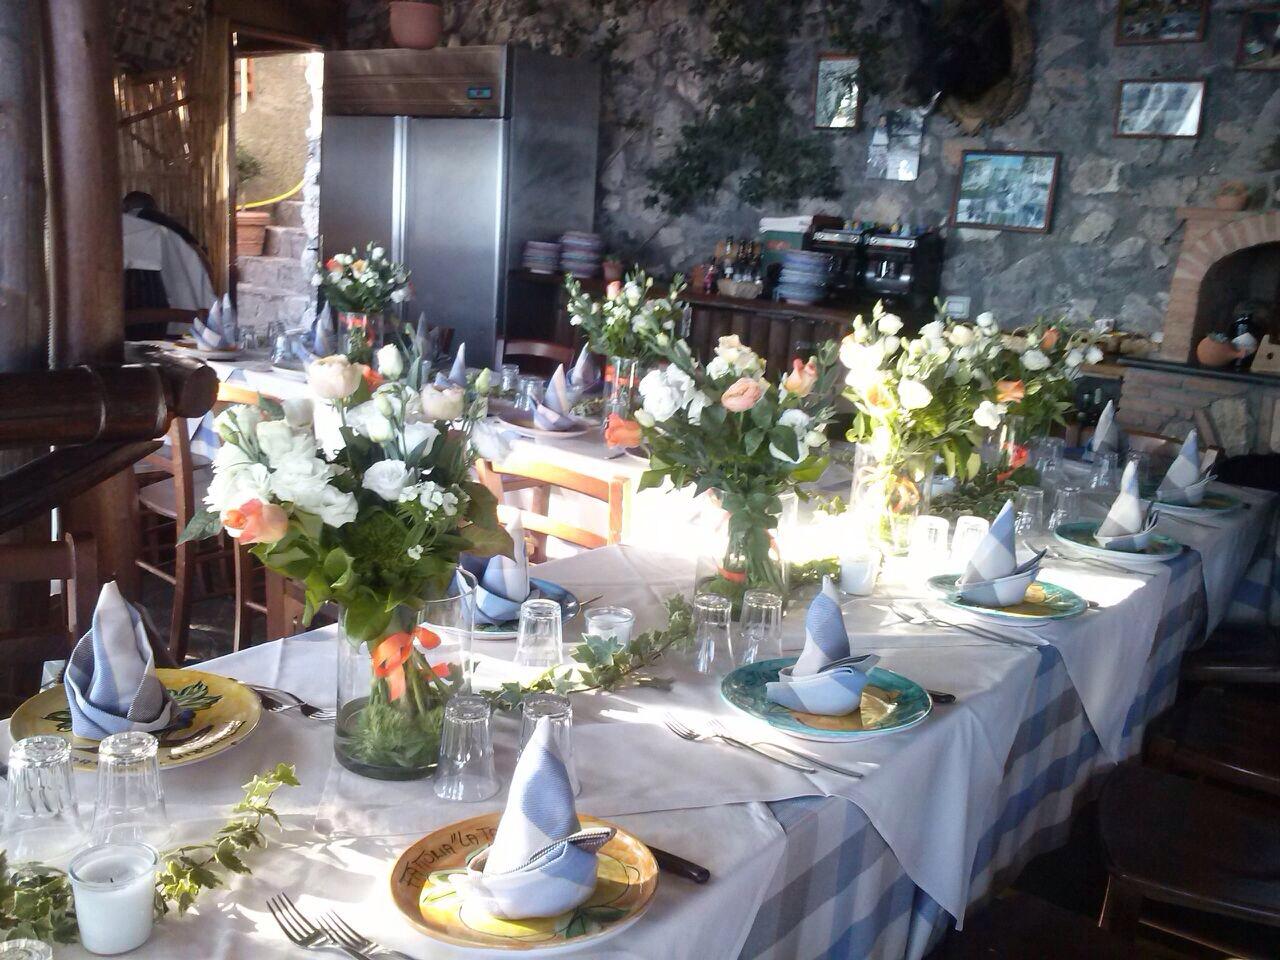 https://www.weddingamalfi.com/wp-content/uploads/Laura-and-Jarrod-fresh-flowers-wedding-table.jpg